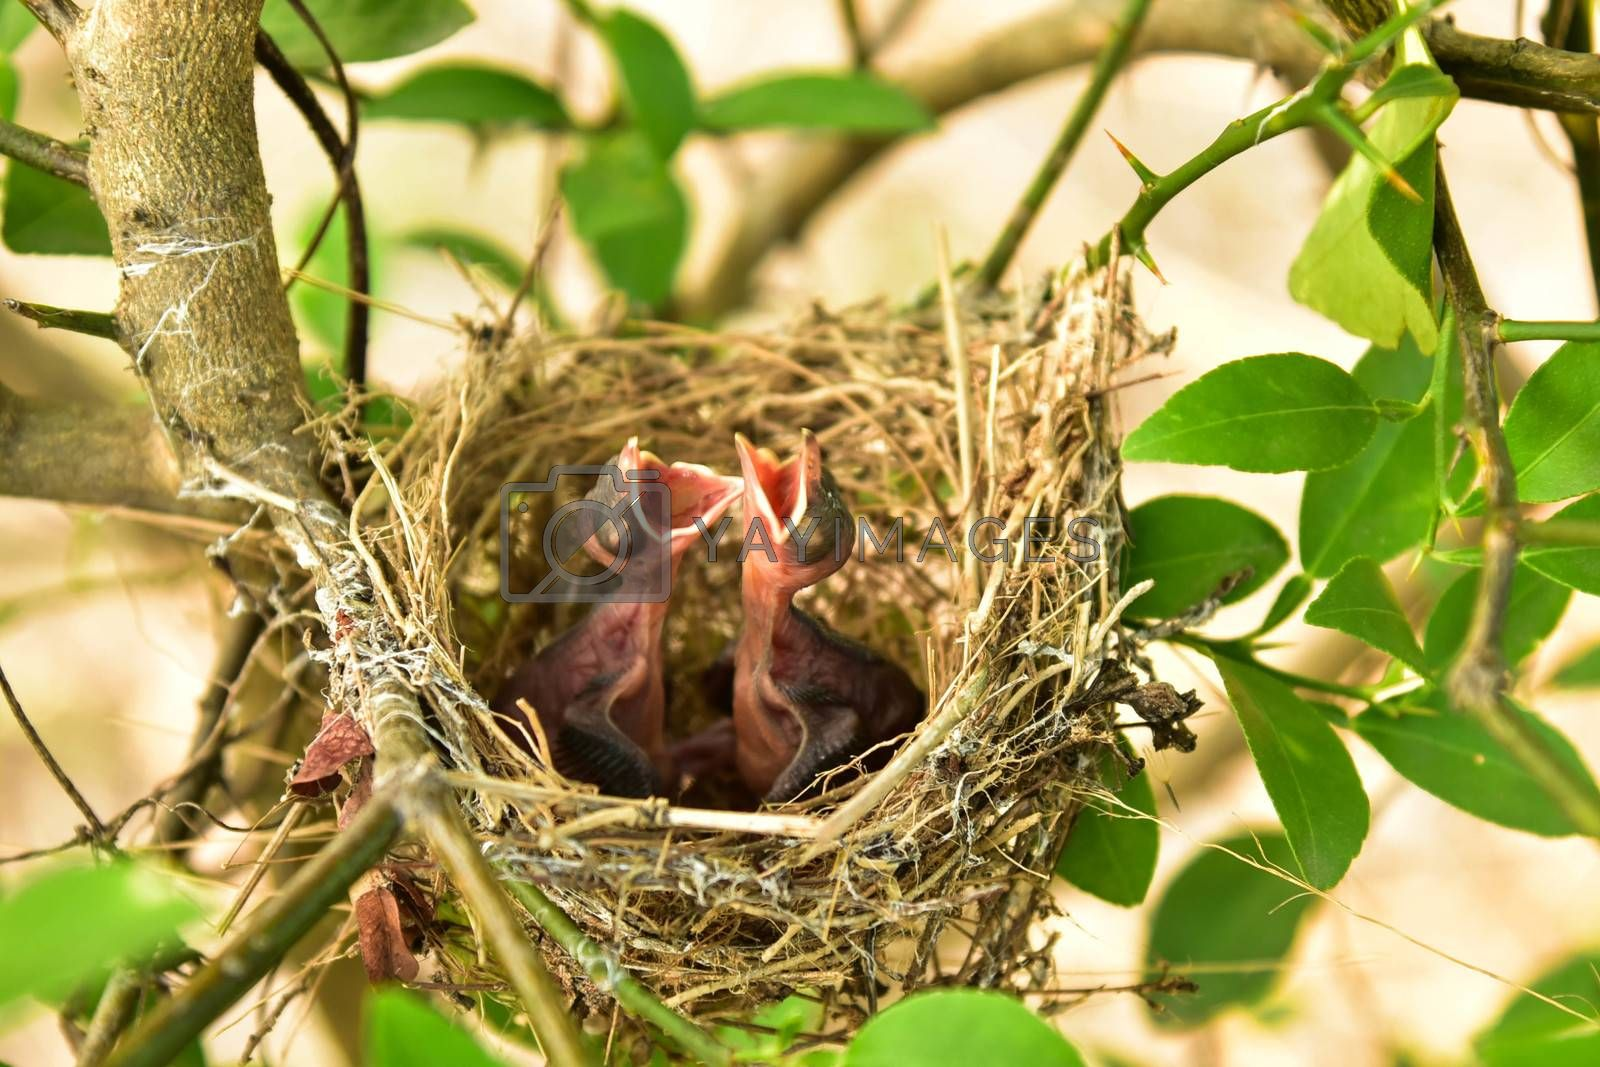 Small babies by jengit